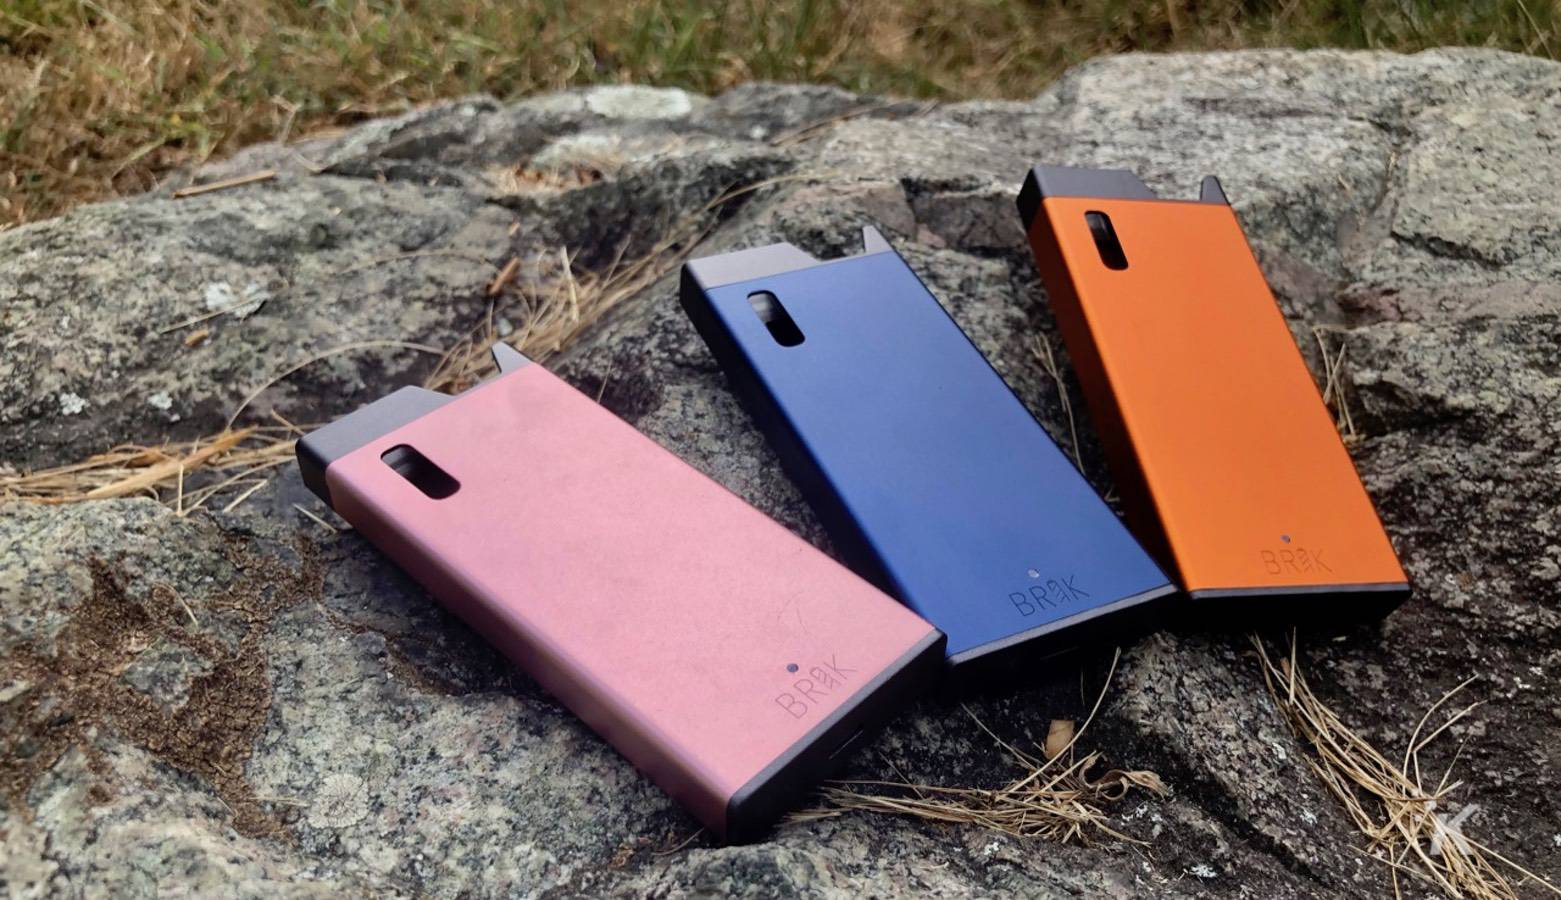 brik juul portable charger knowtechie review